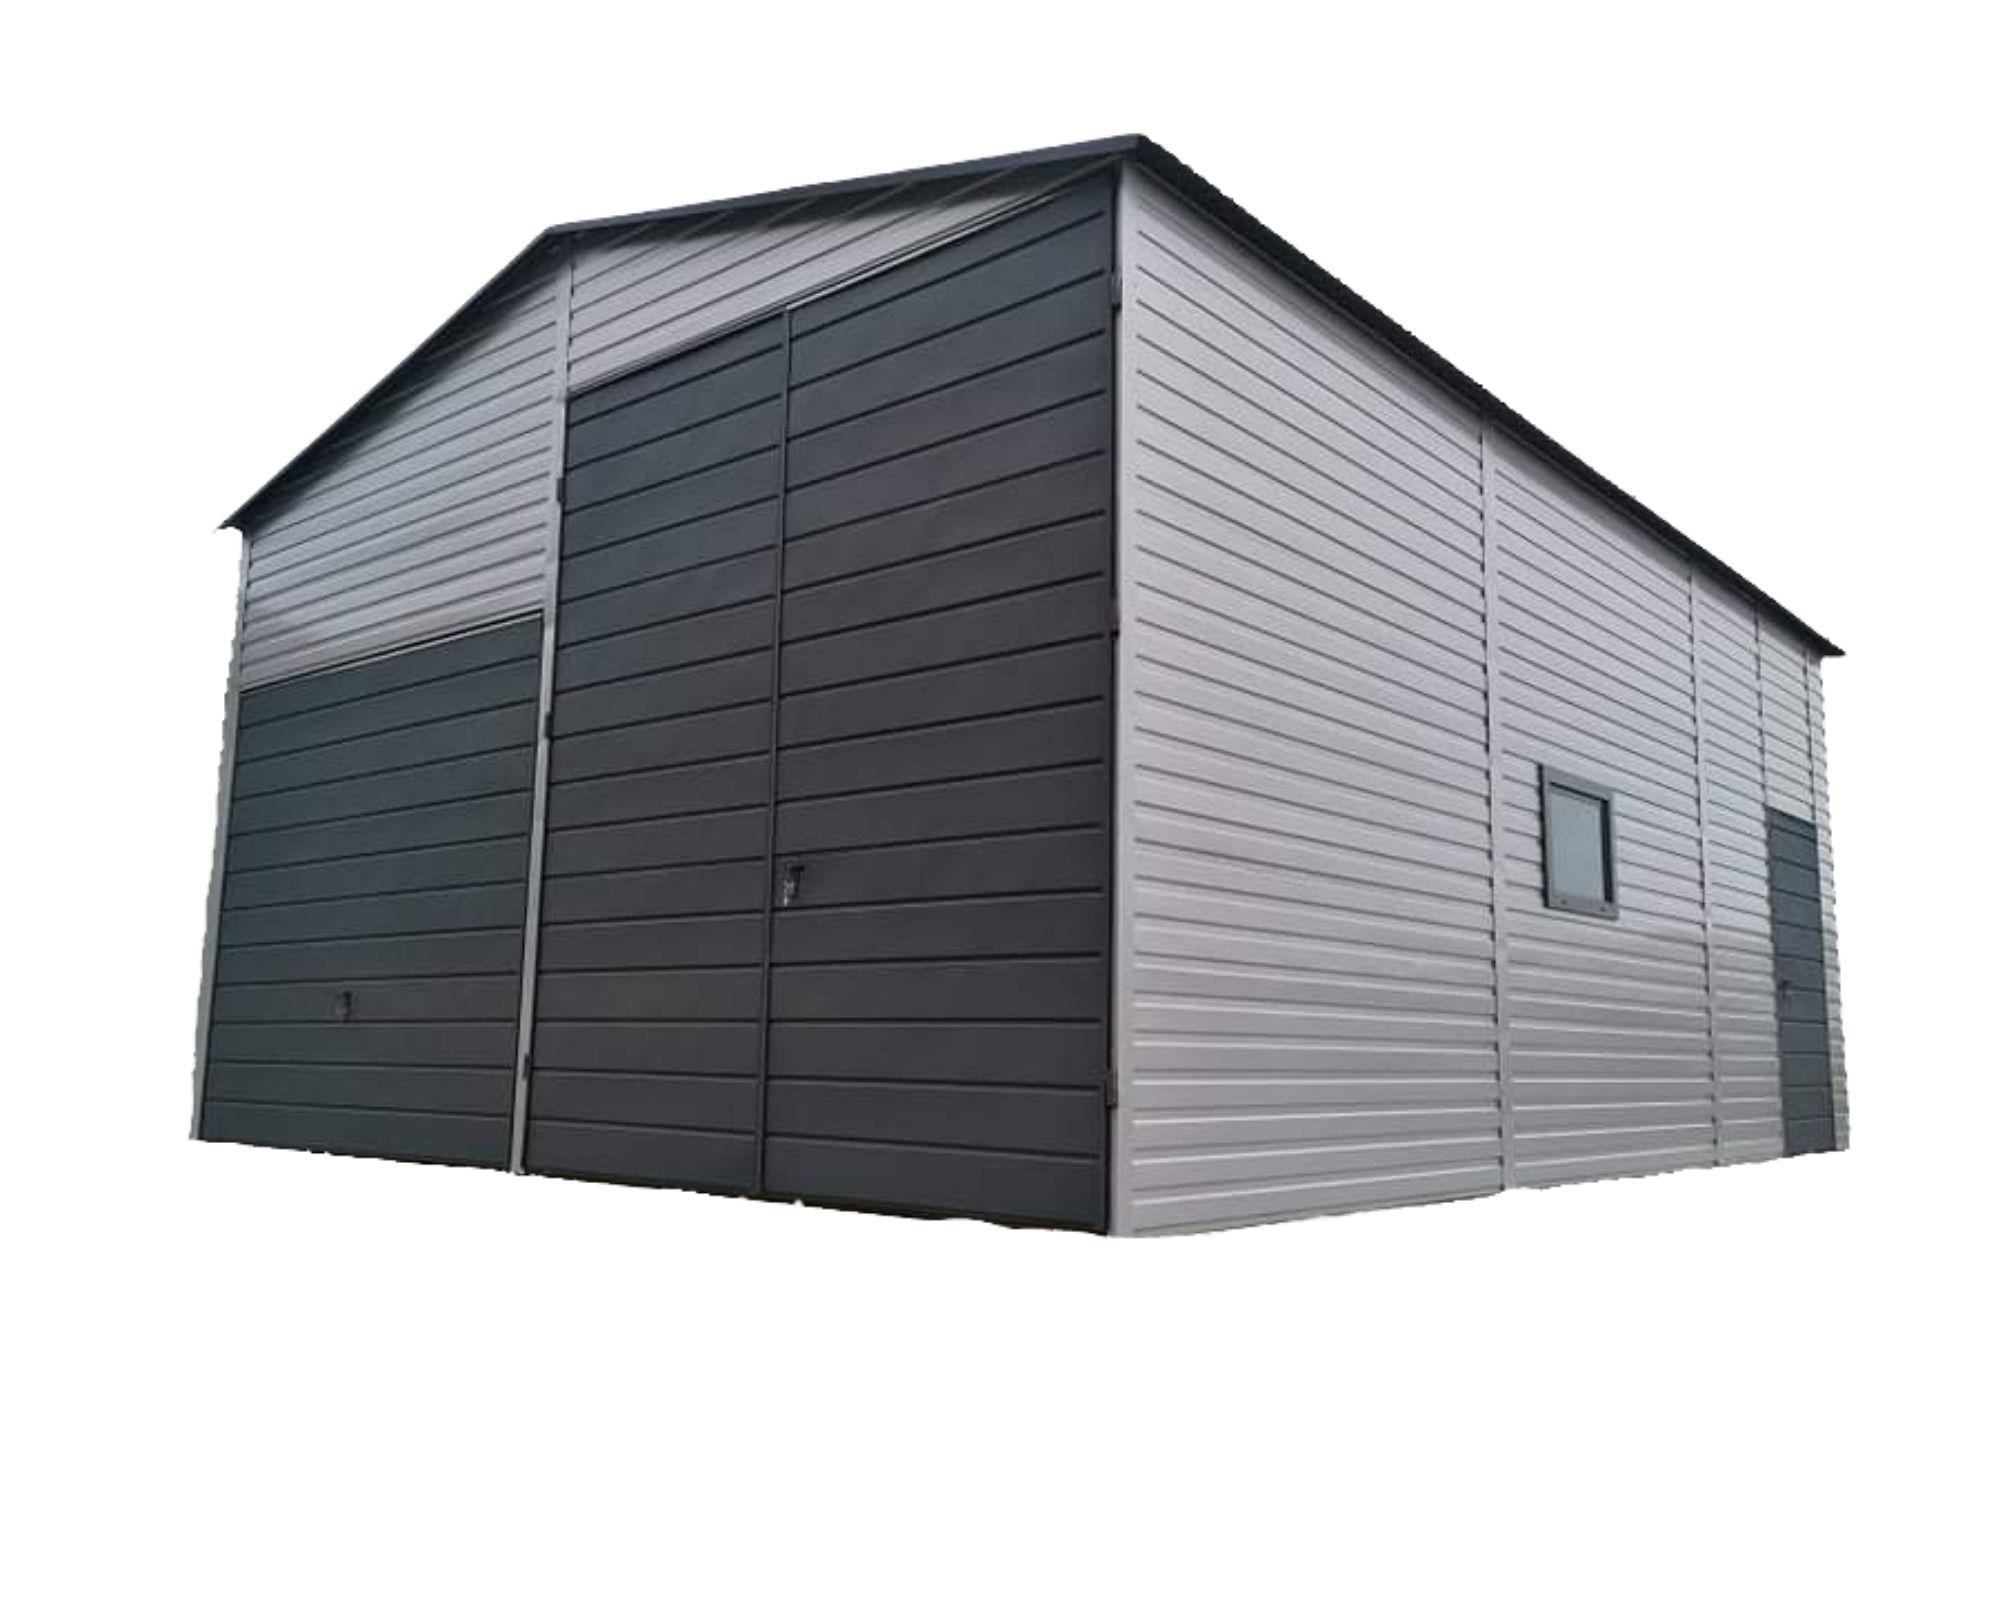 Жестяные гаражи, навес, навес, склад 6х10